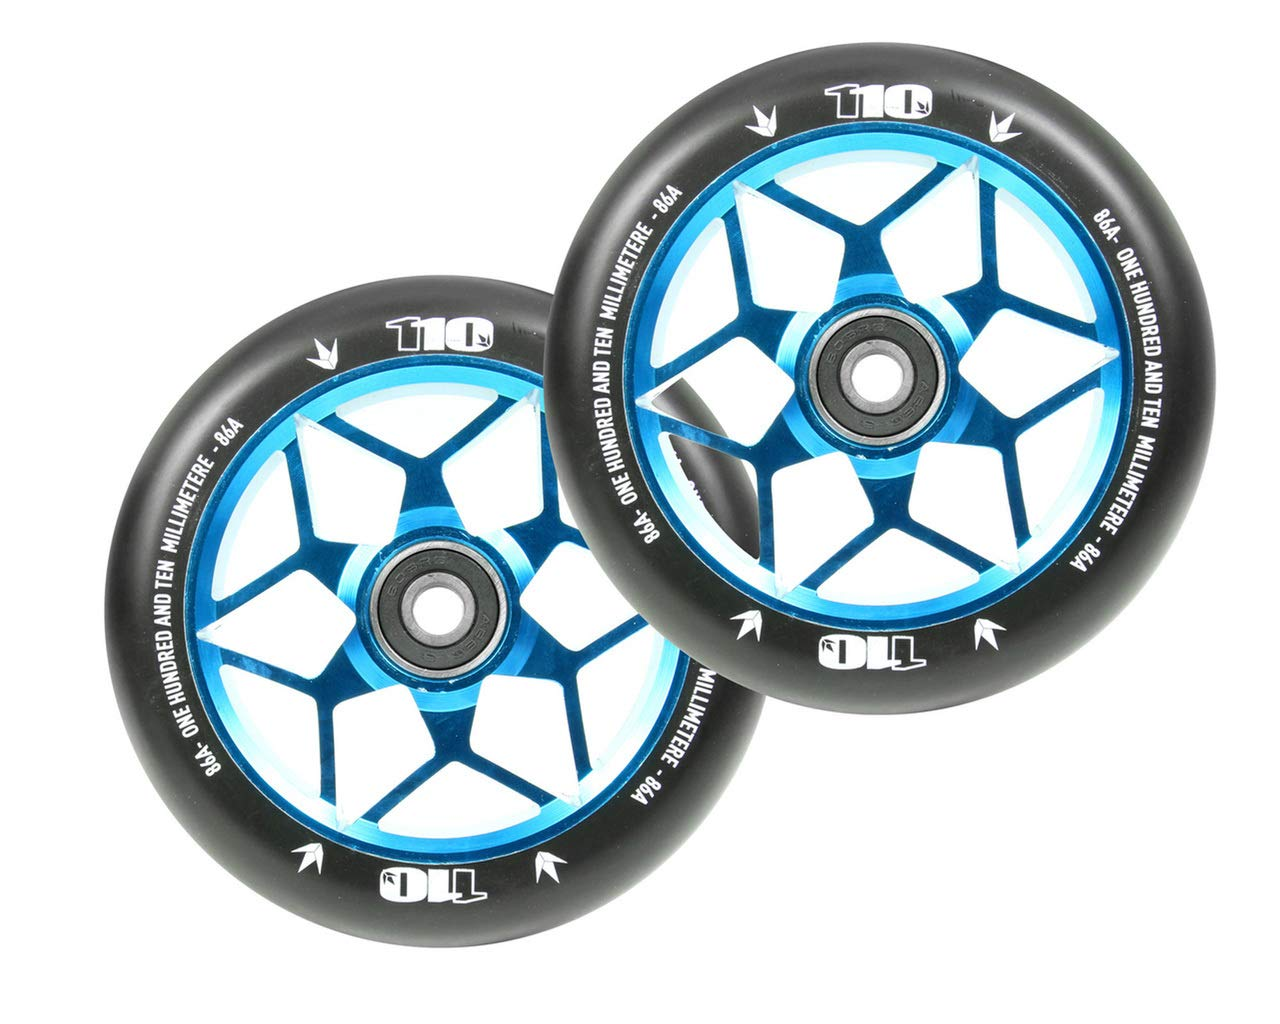 Black BLUNT Scooters 110mm DIAMOND WHEELS